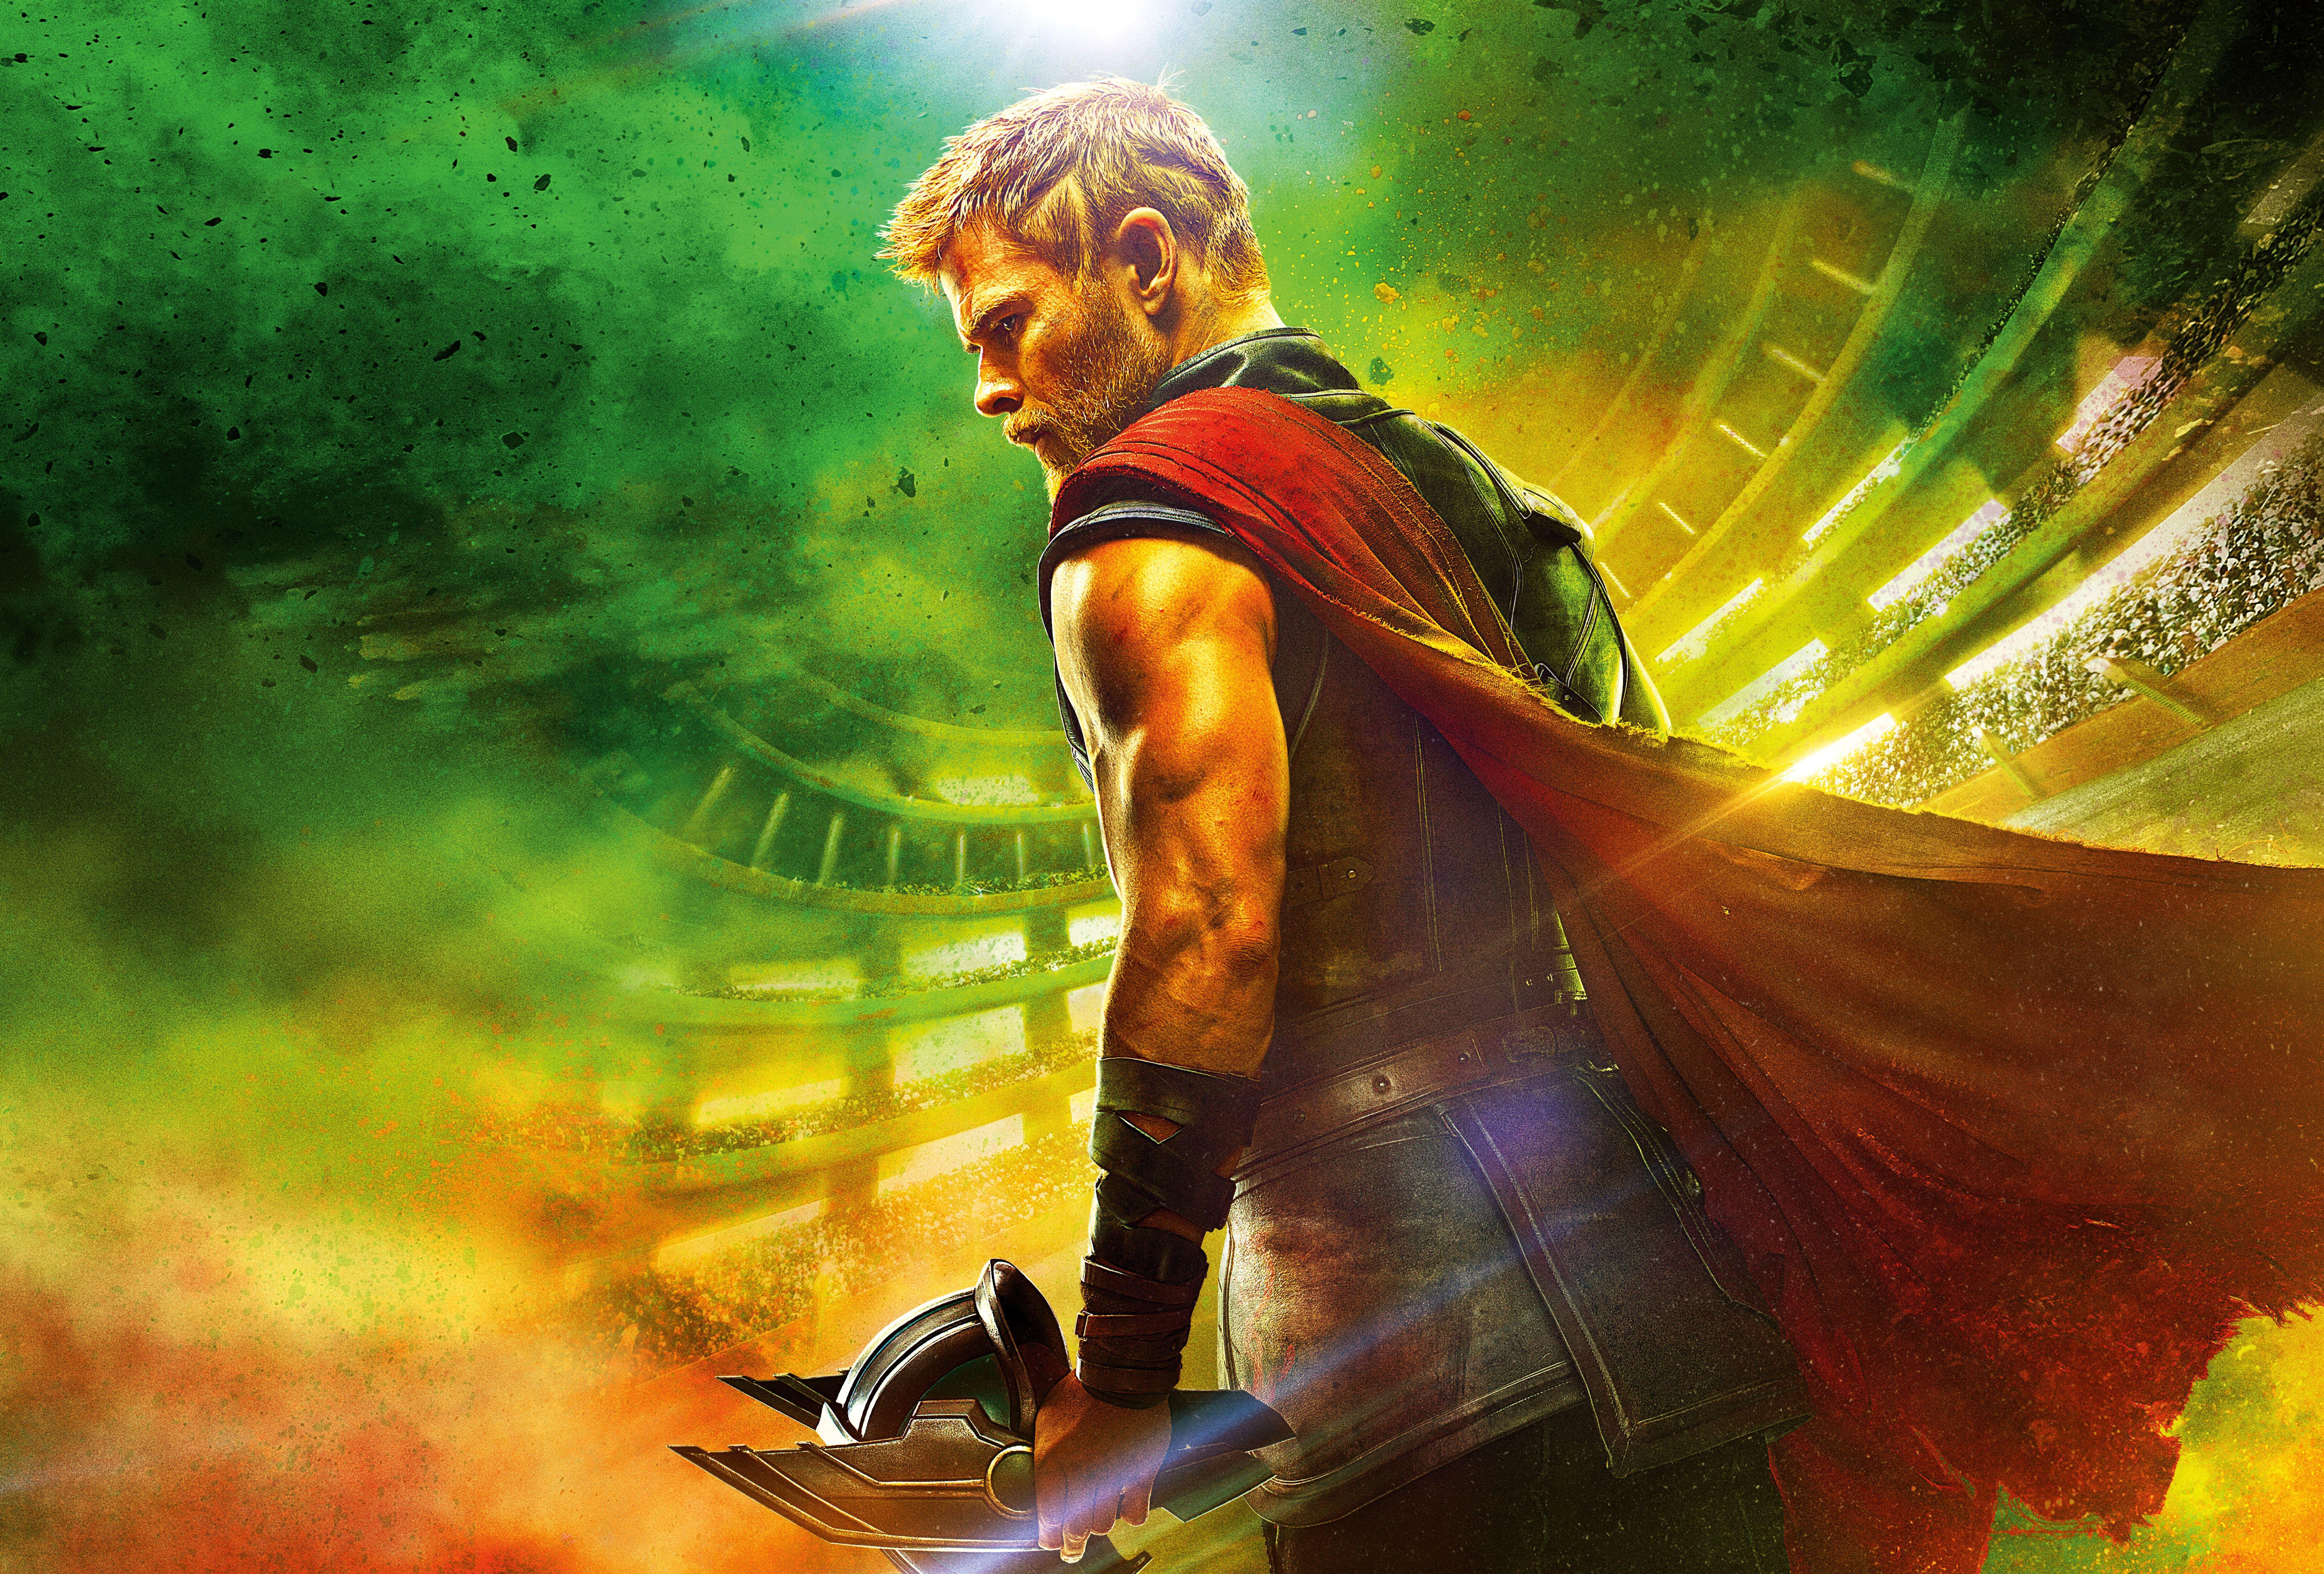 Thor: Ragnarok HD Wallpapers - Wallpaper Cave